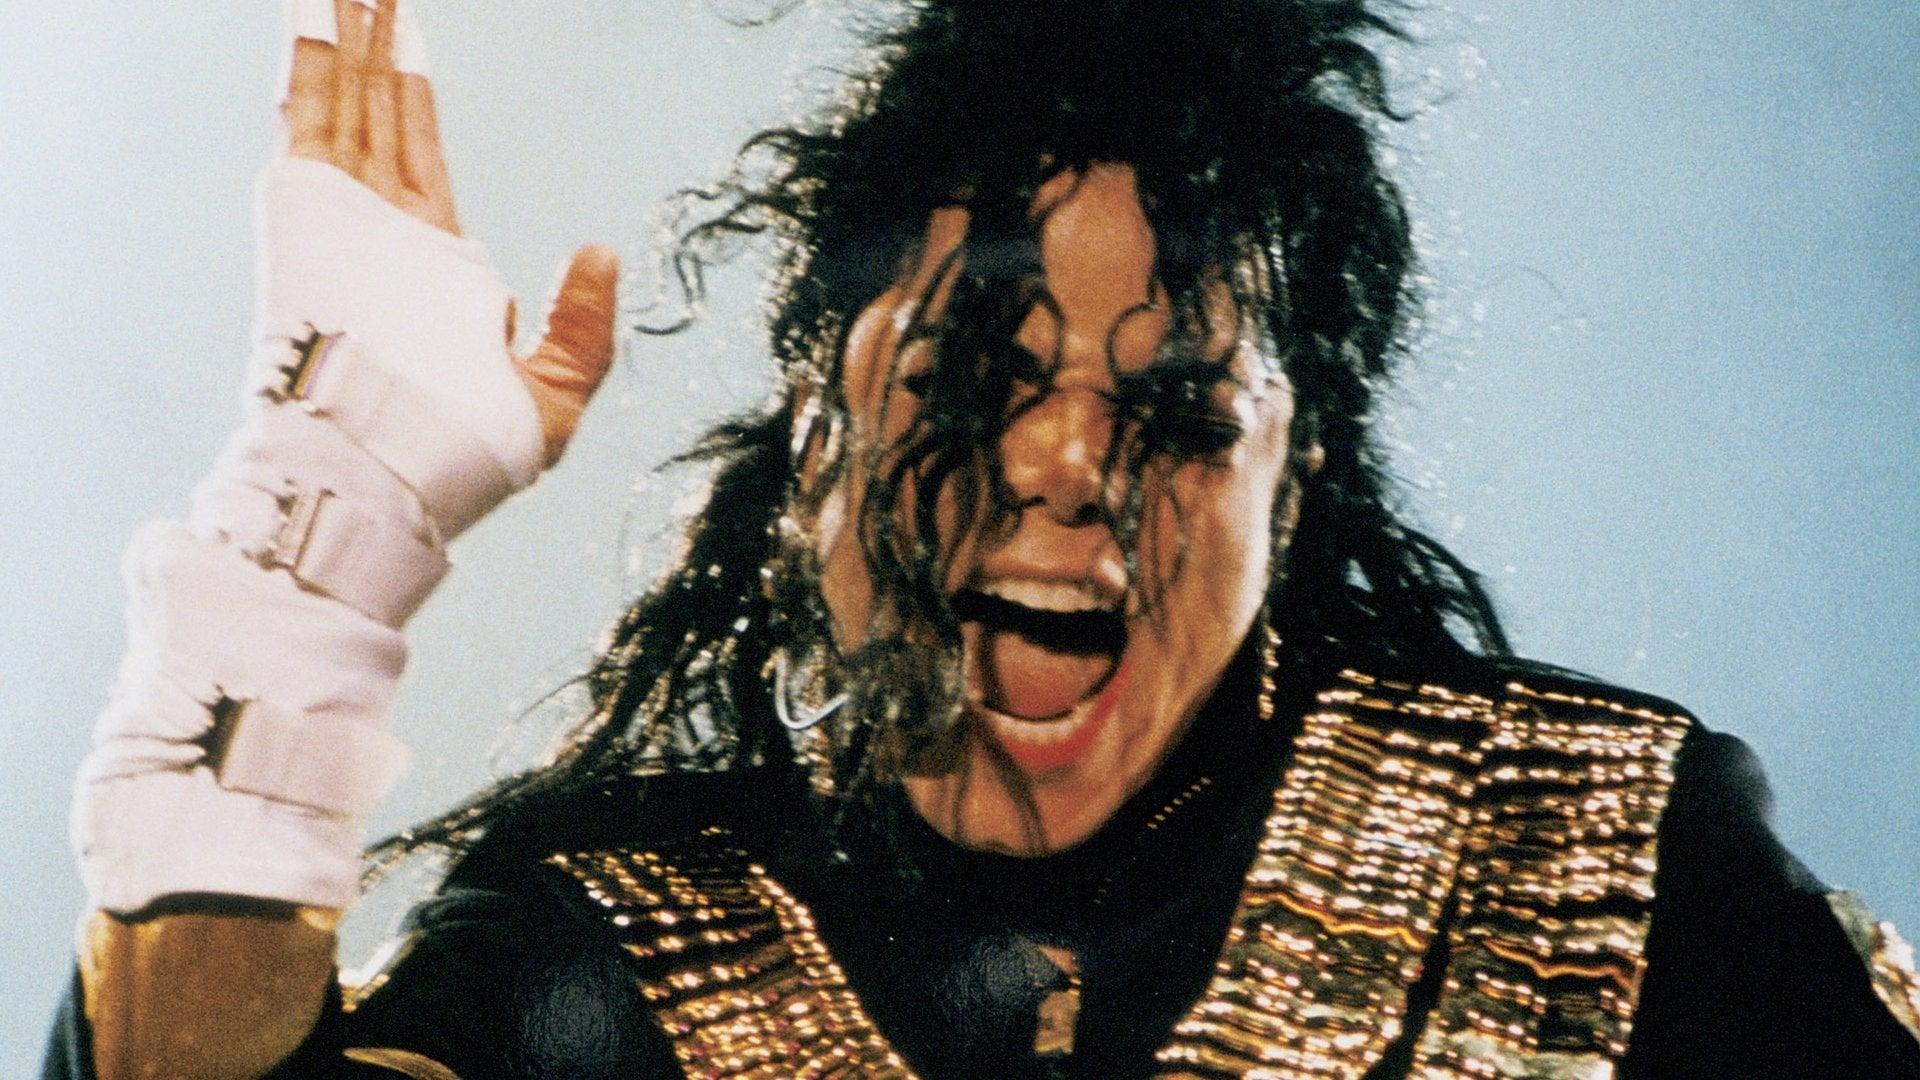 Michael Jackson: Remember the King